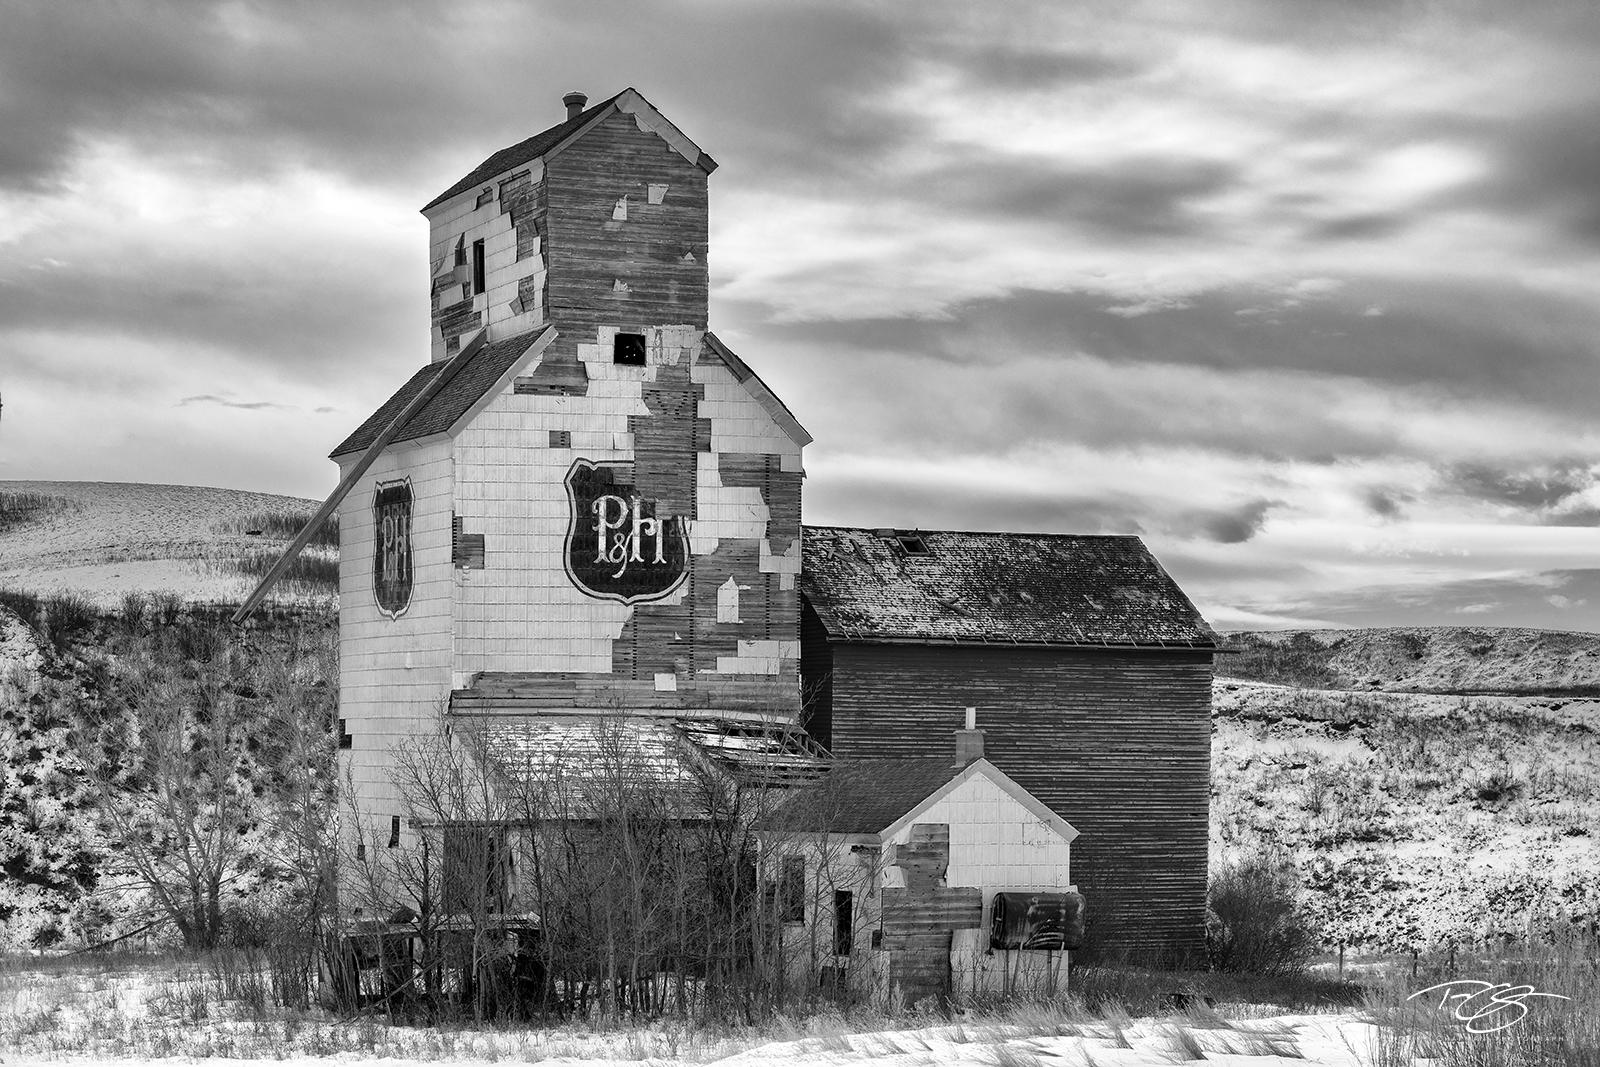 A near century old Parrish & Heimbecker grain elevator slowly succumbs to the harsh prairie winter